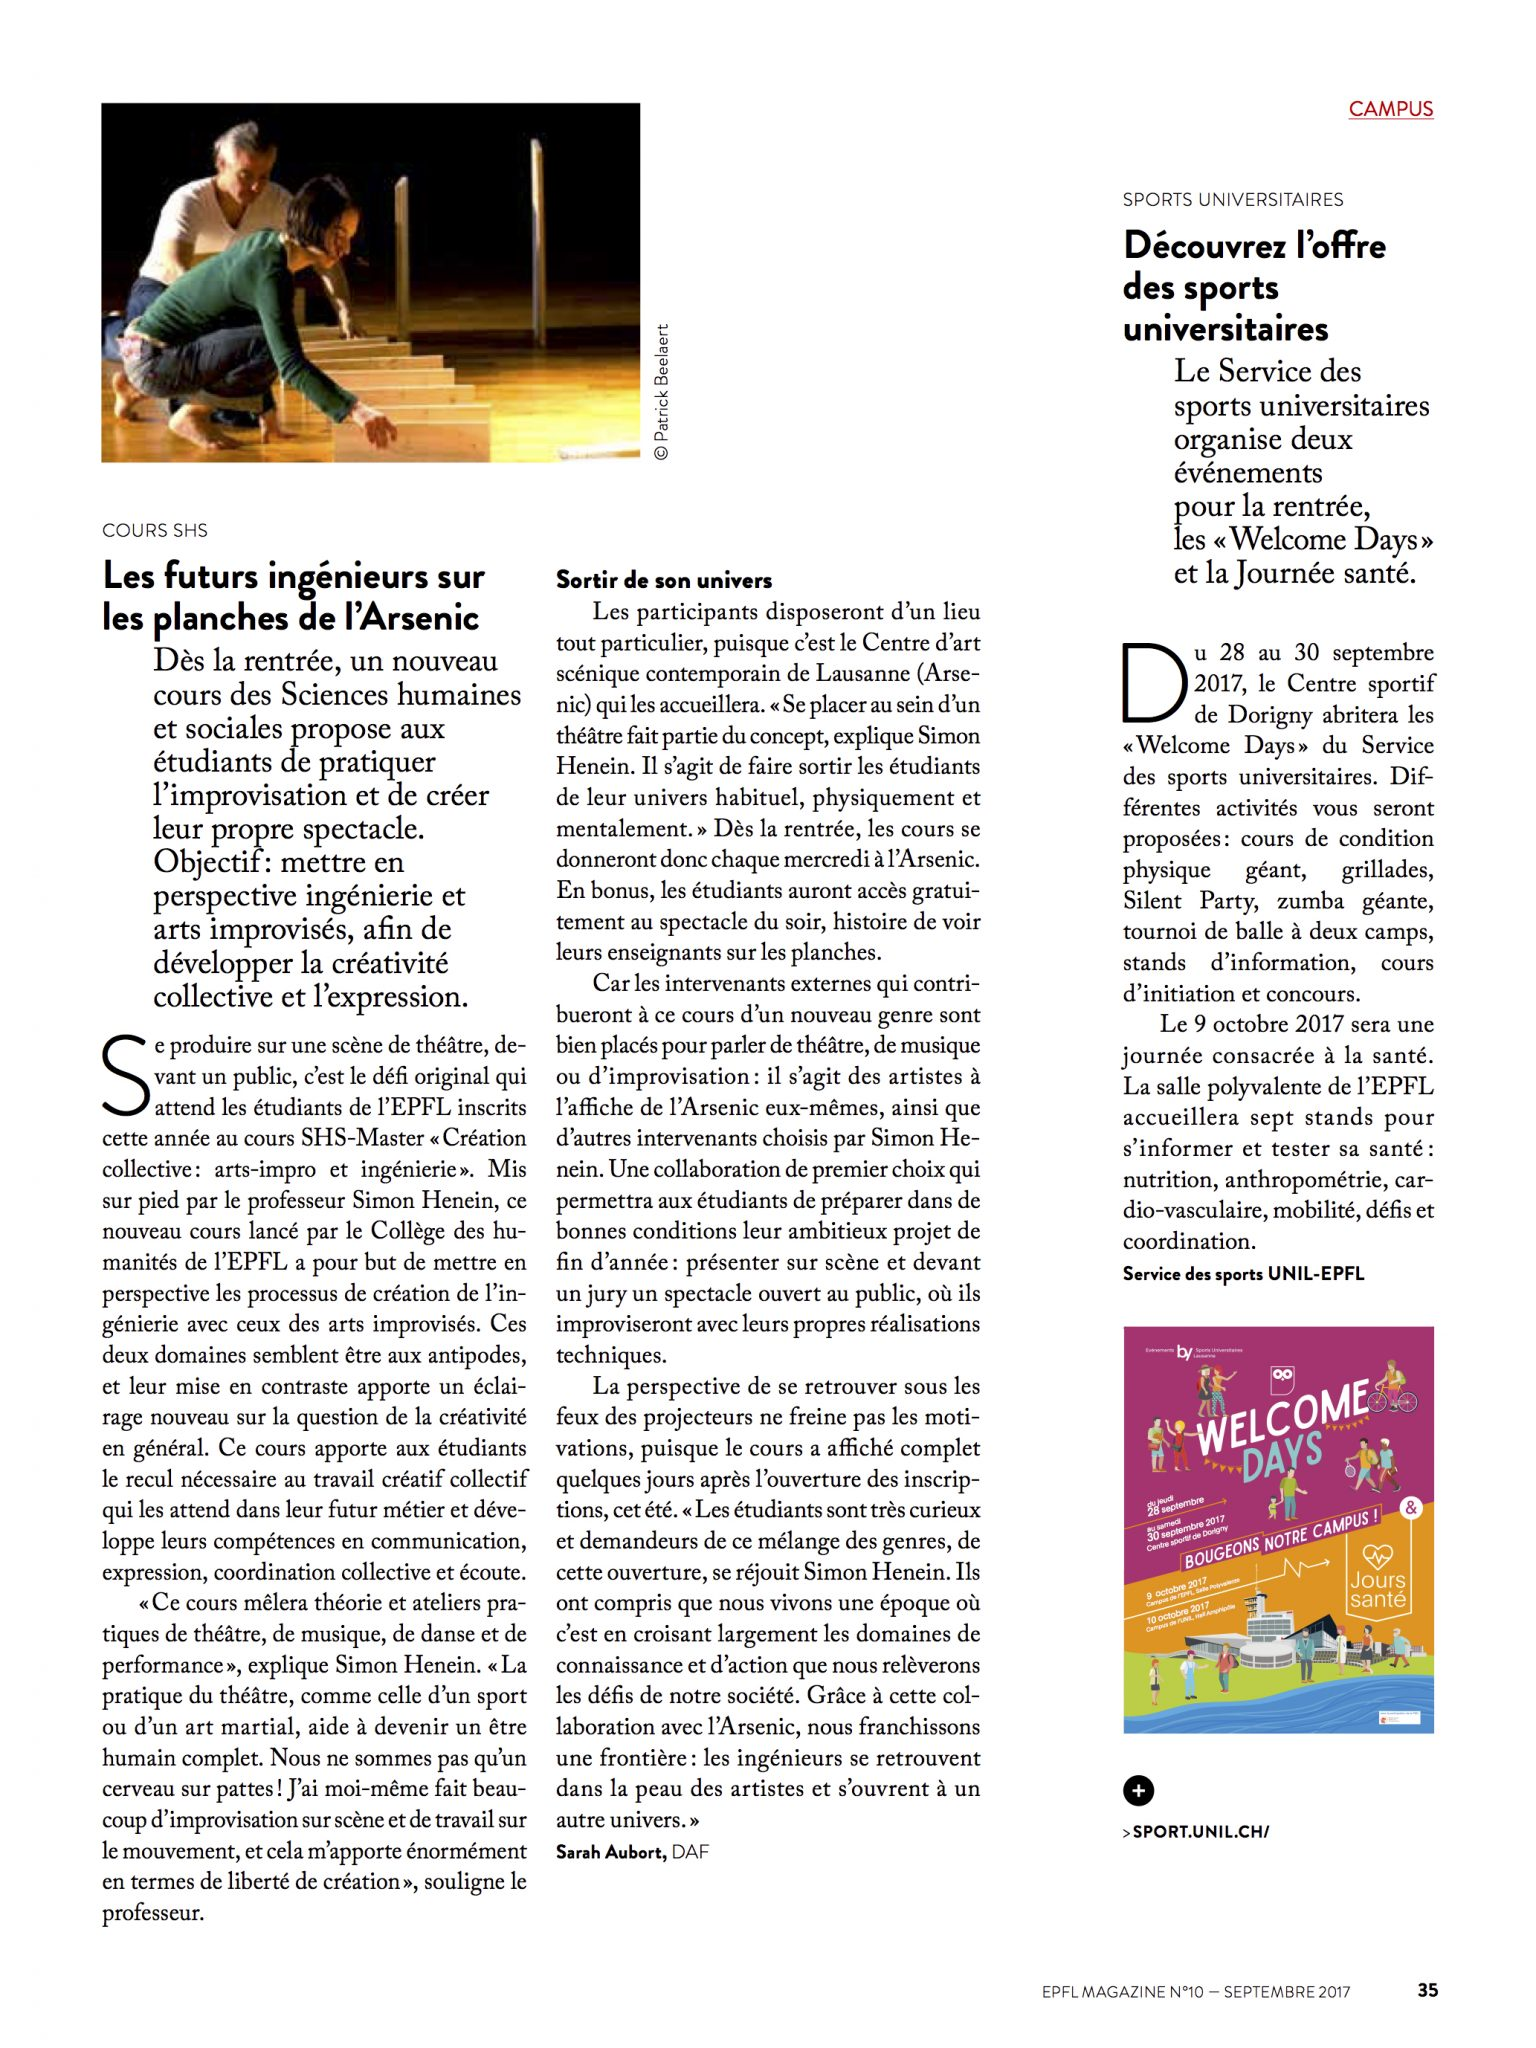 article epfl magazine